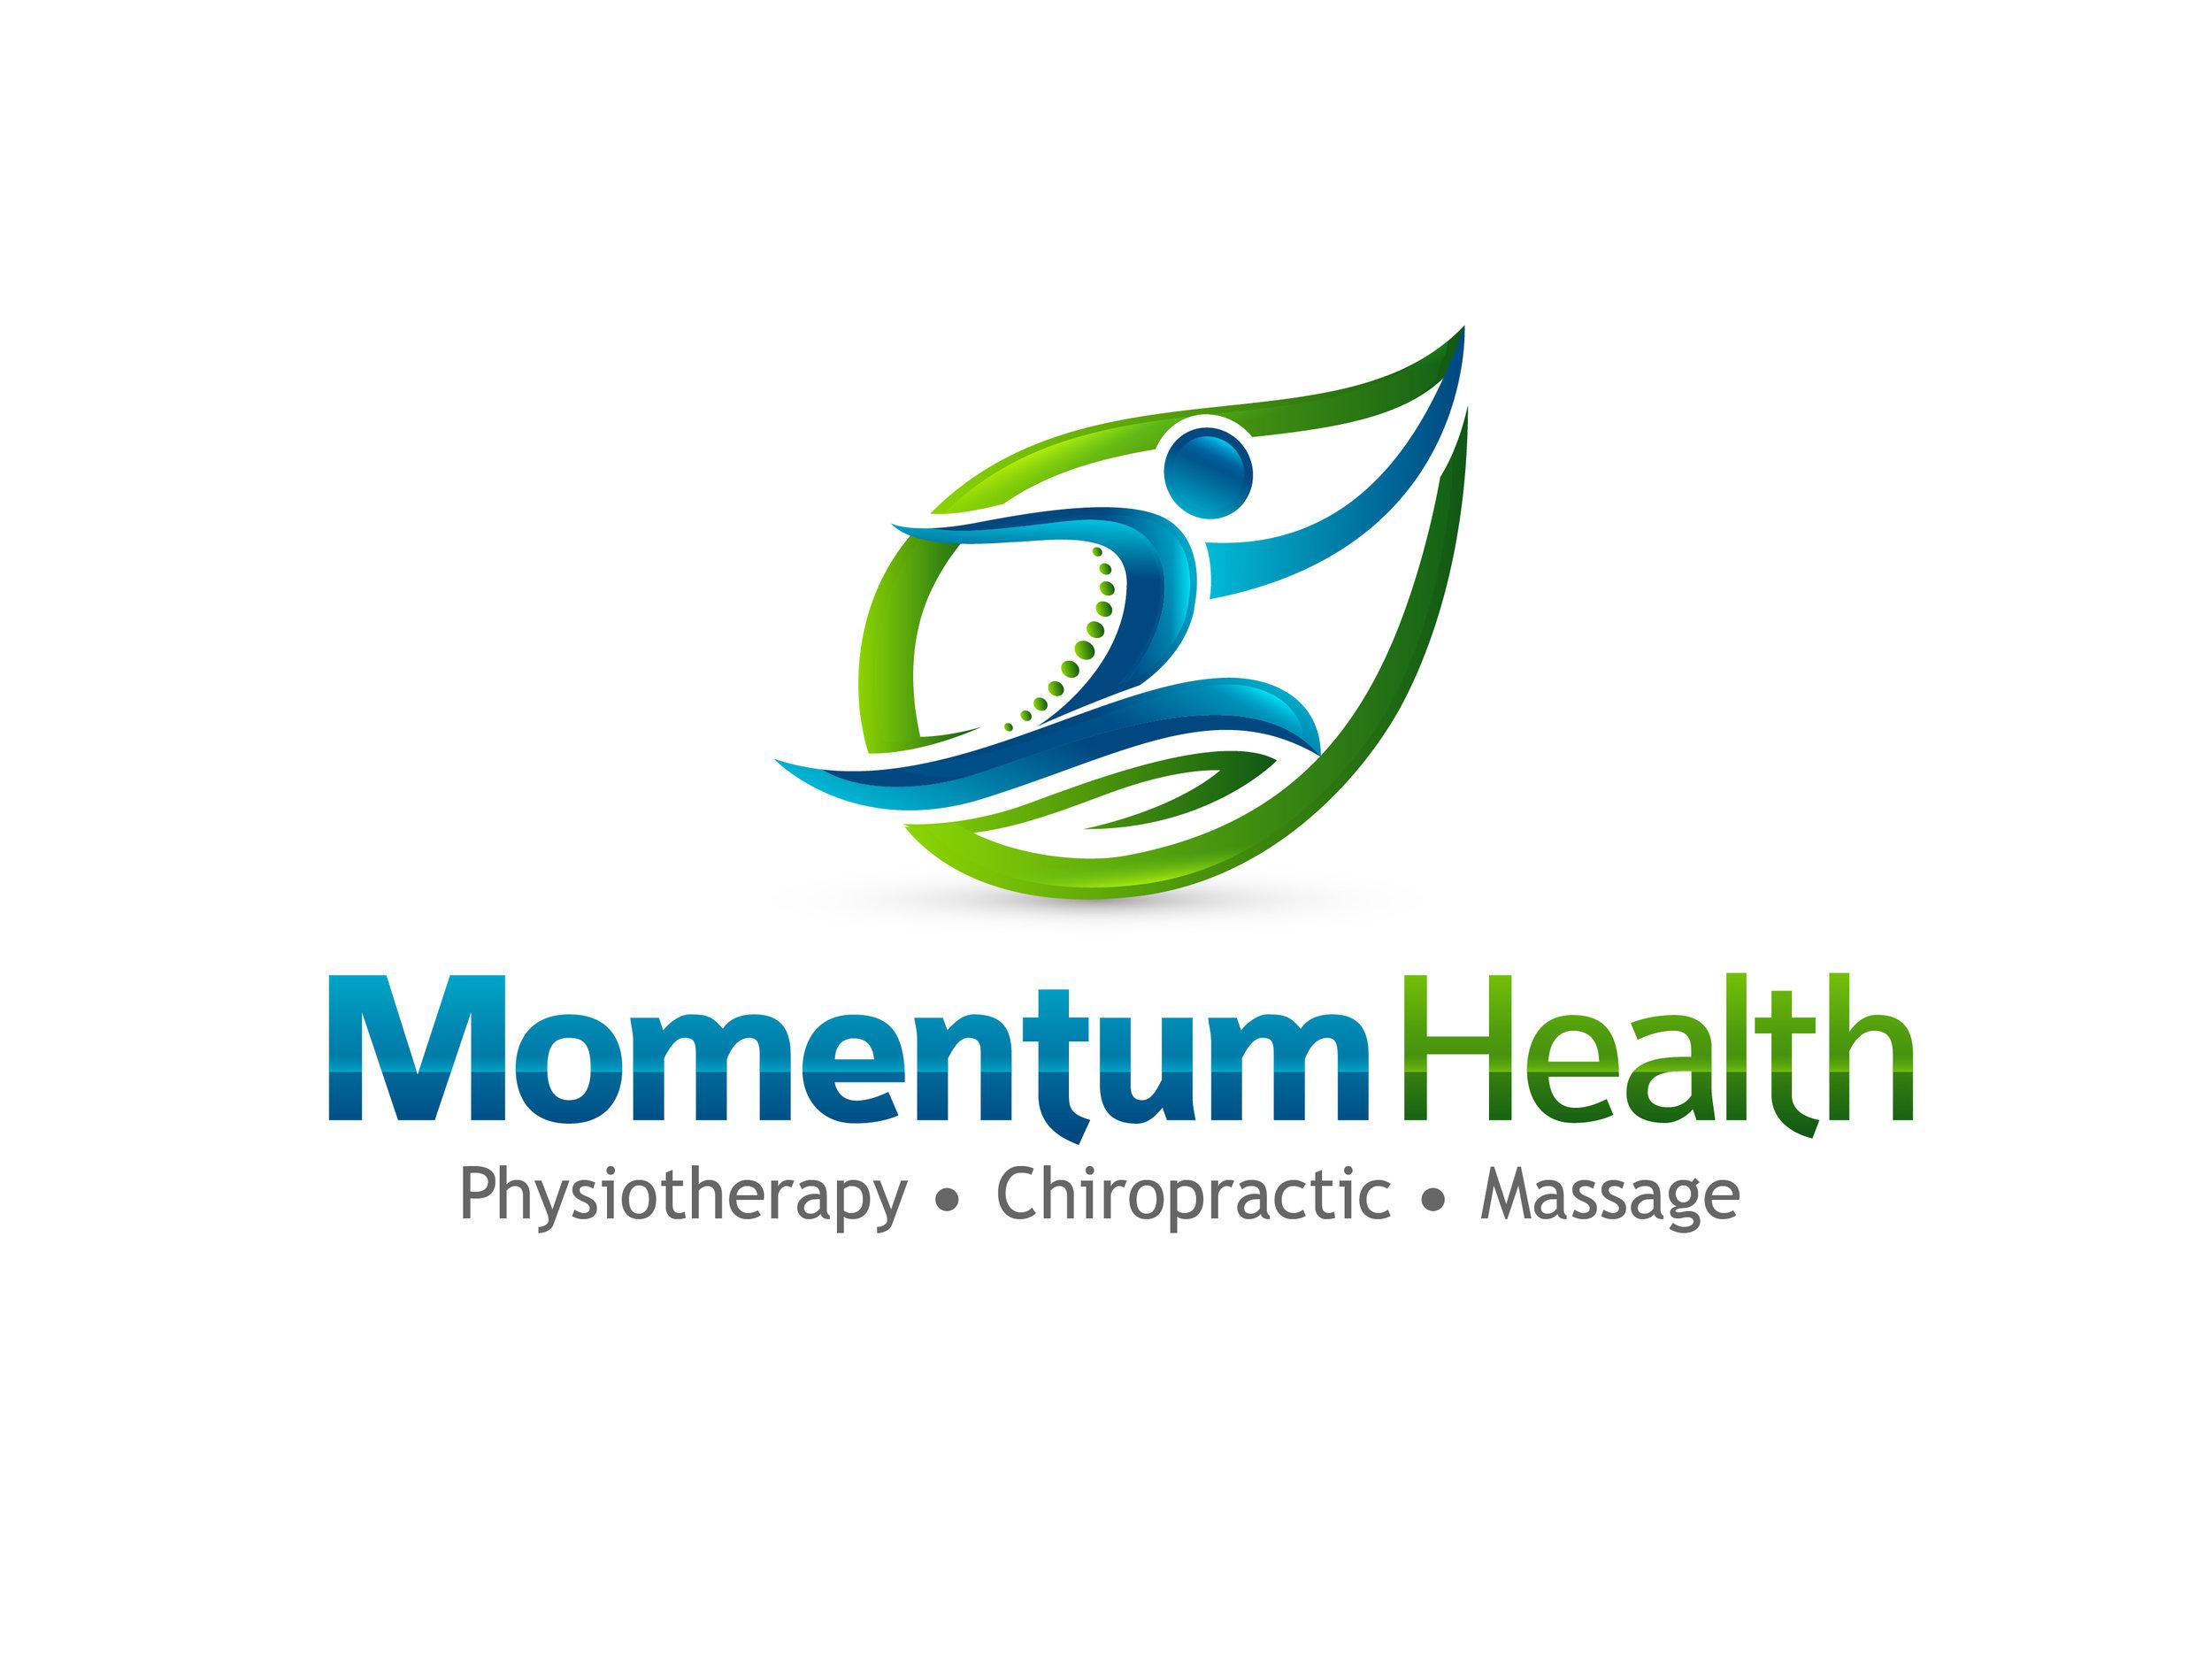 Momentum Health.jpg